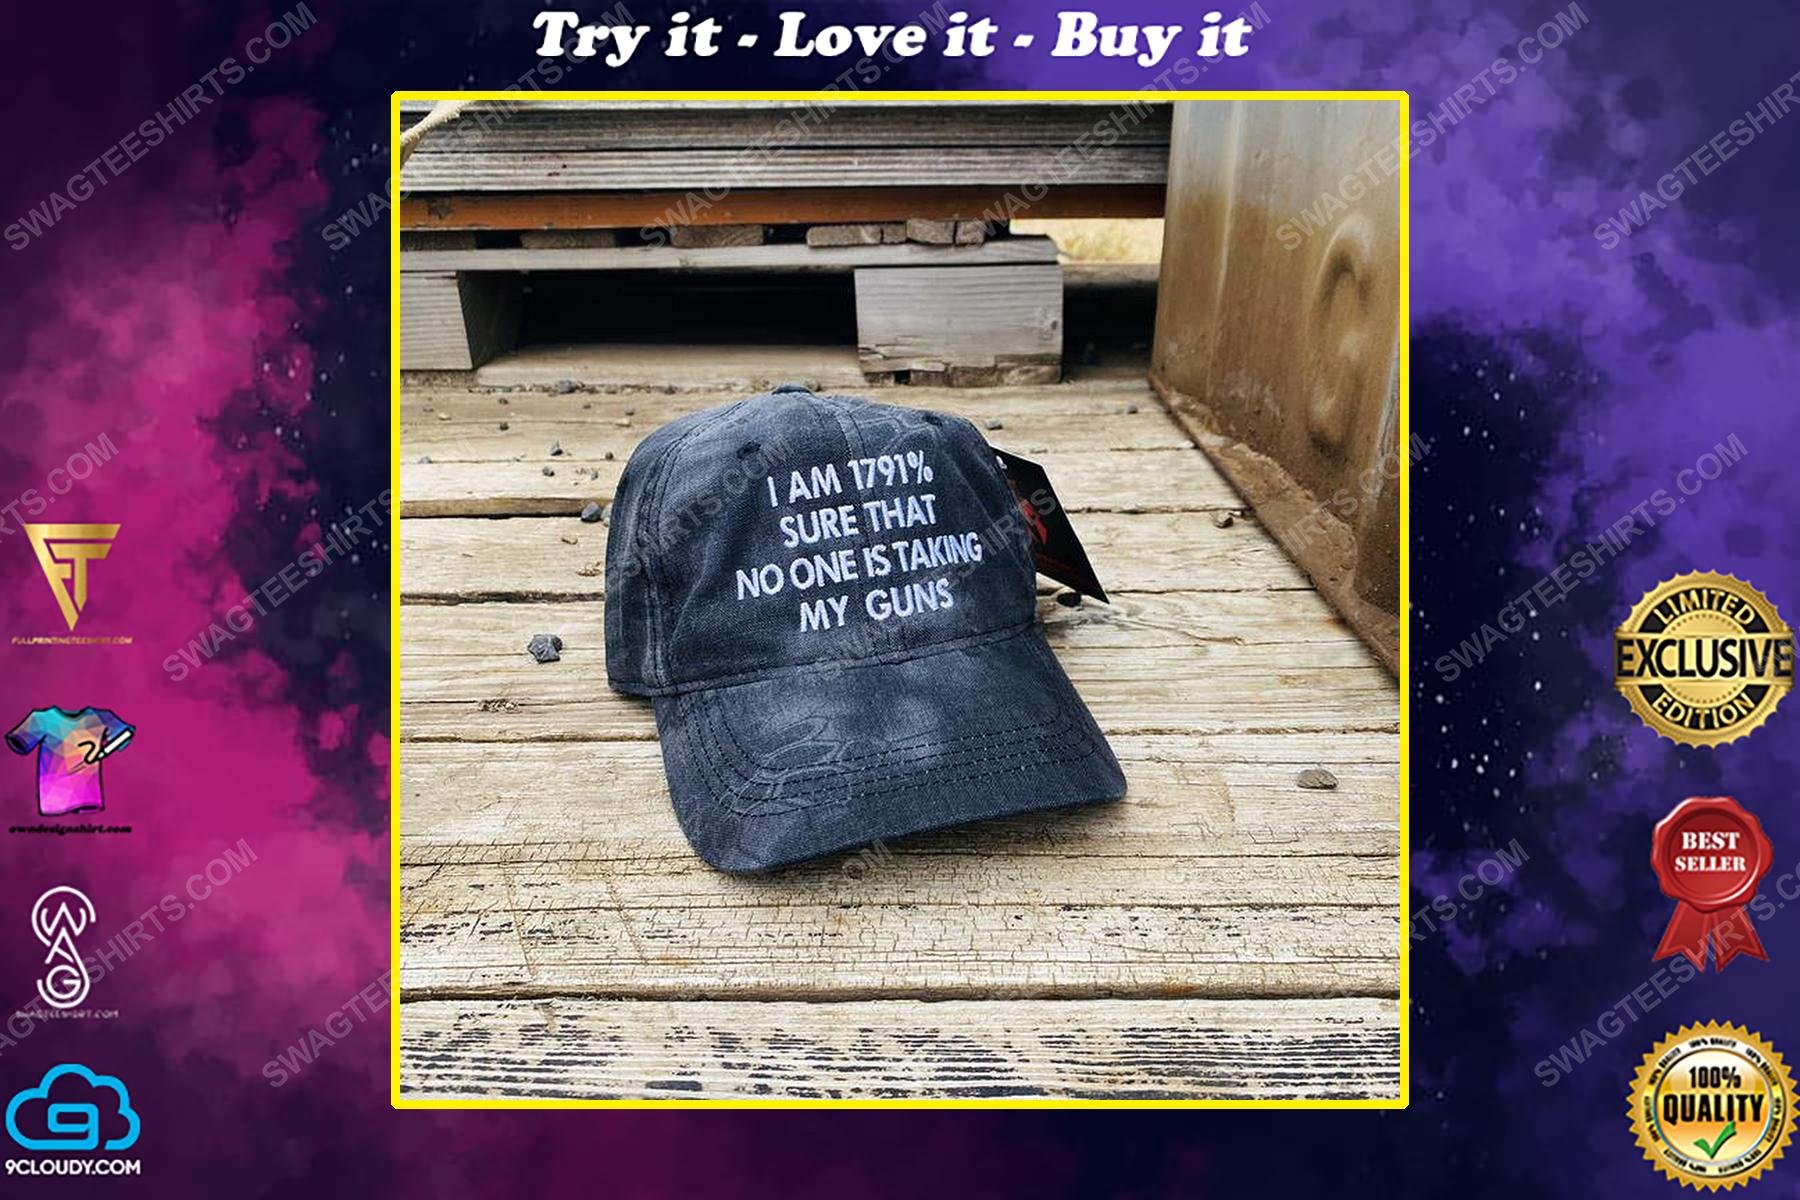 I'm 1791 percent sure that no one is taking my guns full print classic hat